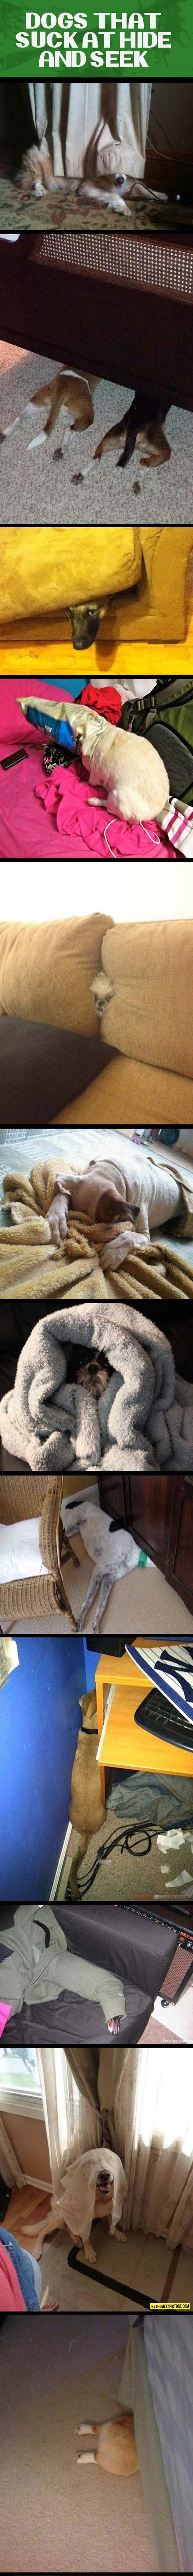 funny-dogs-hiding-seek-bad-cute